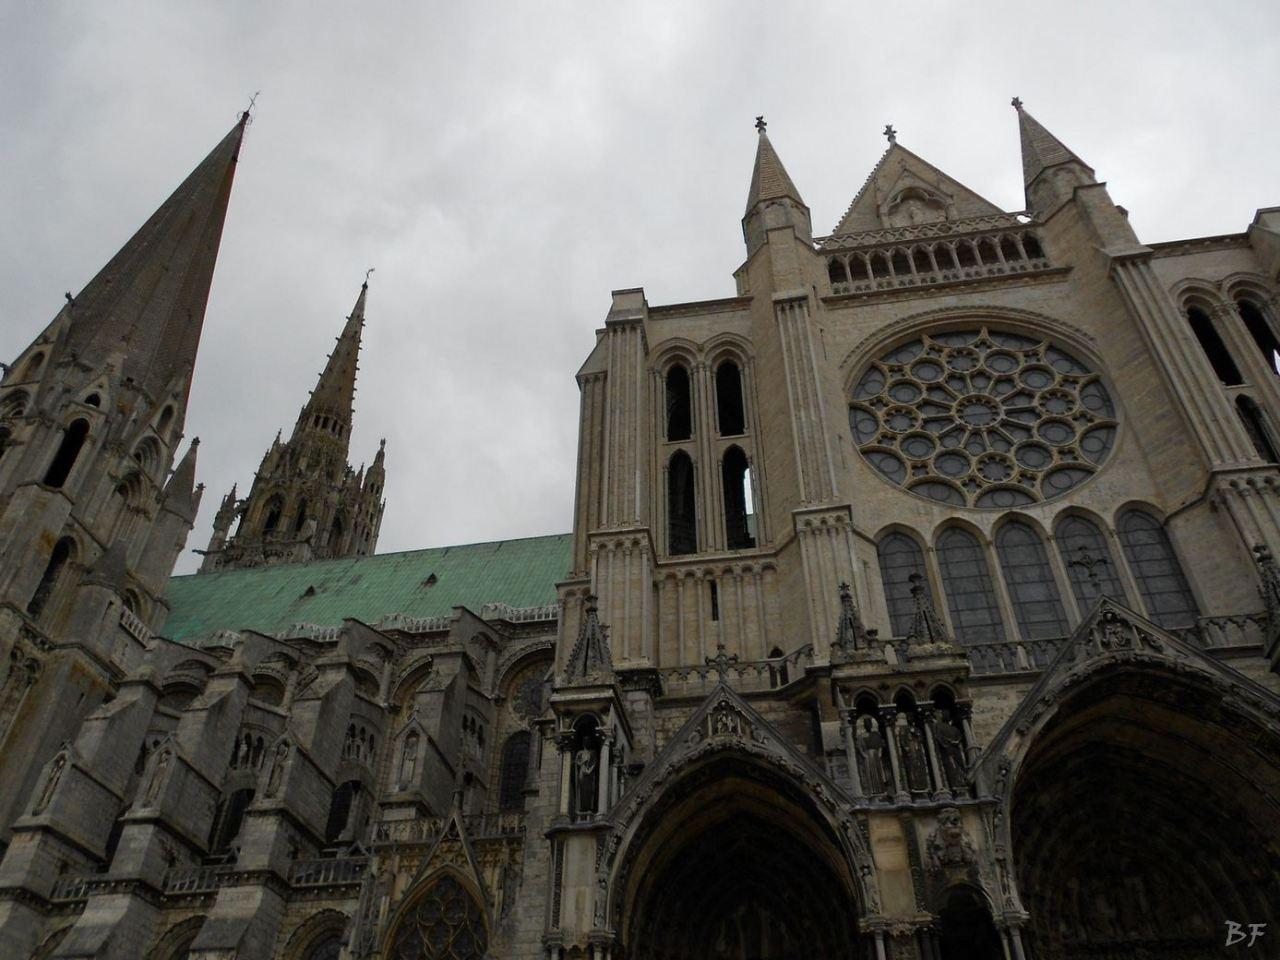 Cattedrale-Gotica-della-Vergine-Chartres-Eure-et-Loir-Centre-Val-de-Loire-Francia-10